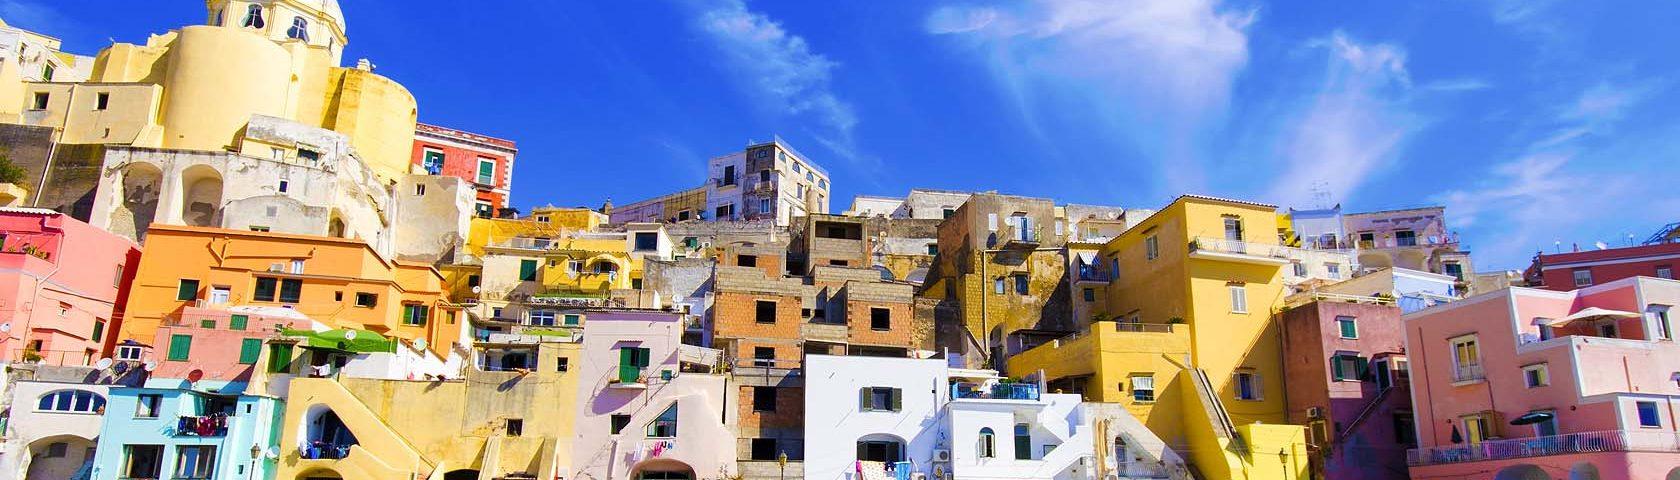 Nápoles. Paquetes all inclusive desde Argentina. Financiaciones. Consultas a info@puravidaviajes.com.ar Tel. (11) 5235-6677.